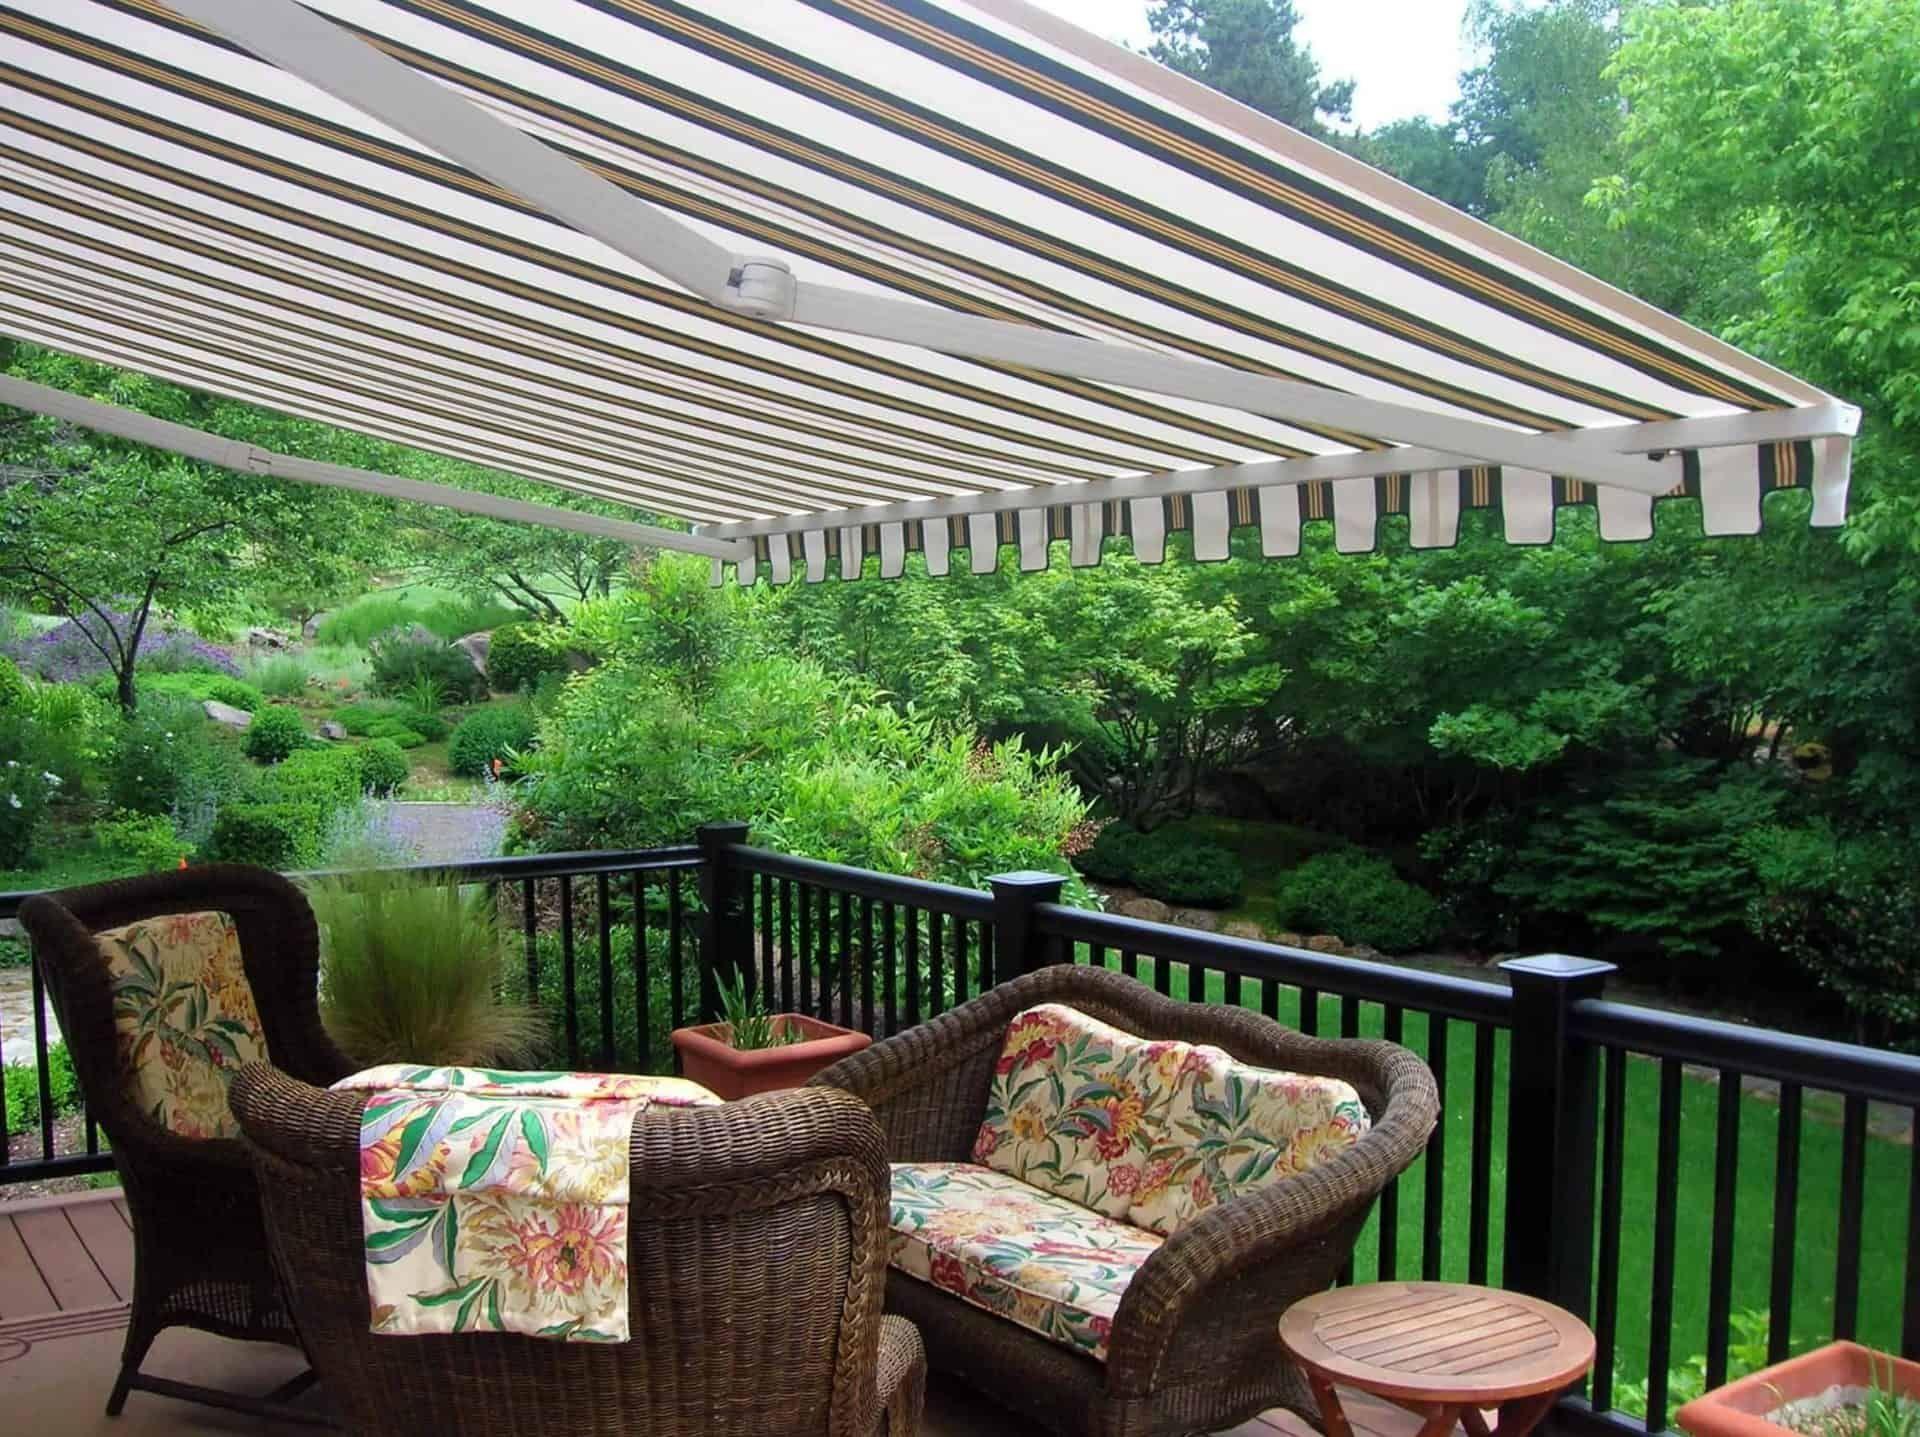 Residential | Residential awnings, Residential, Canopy